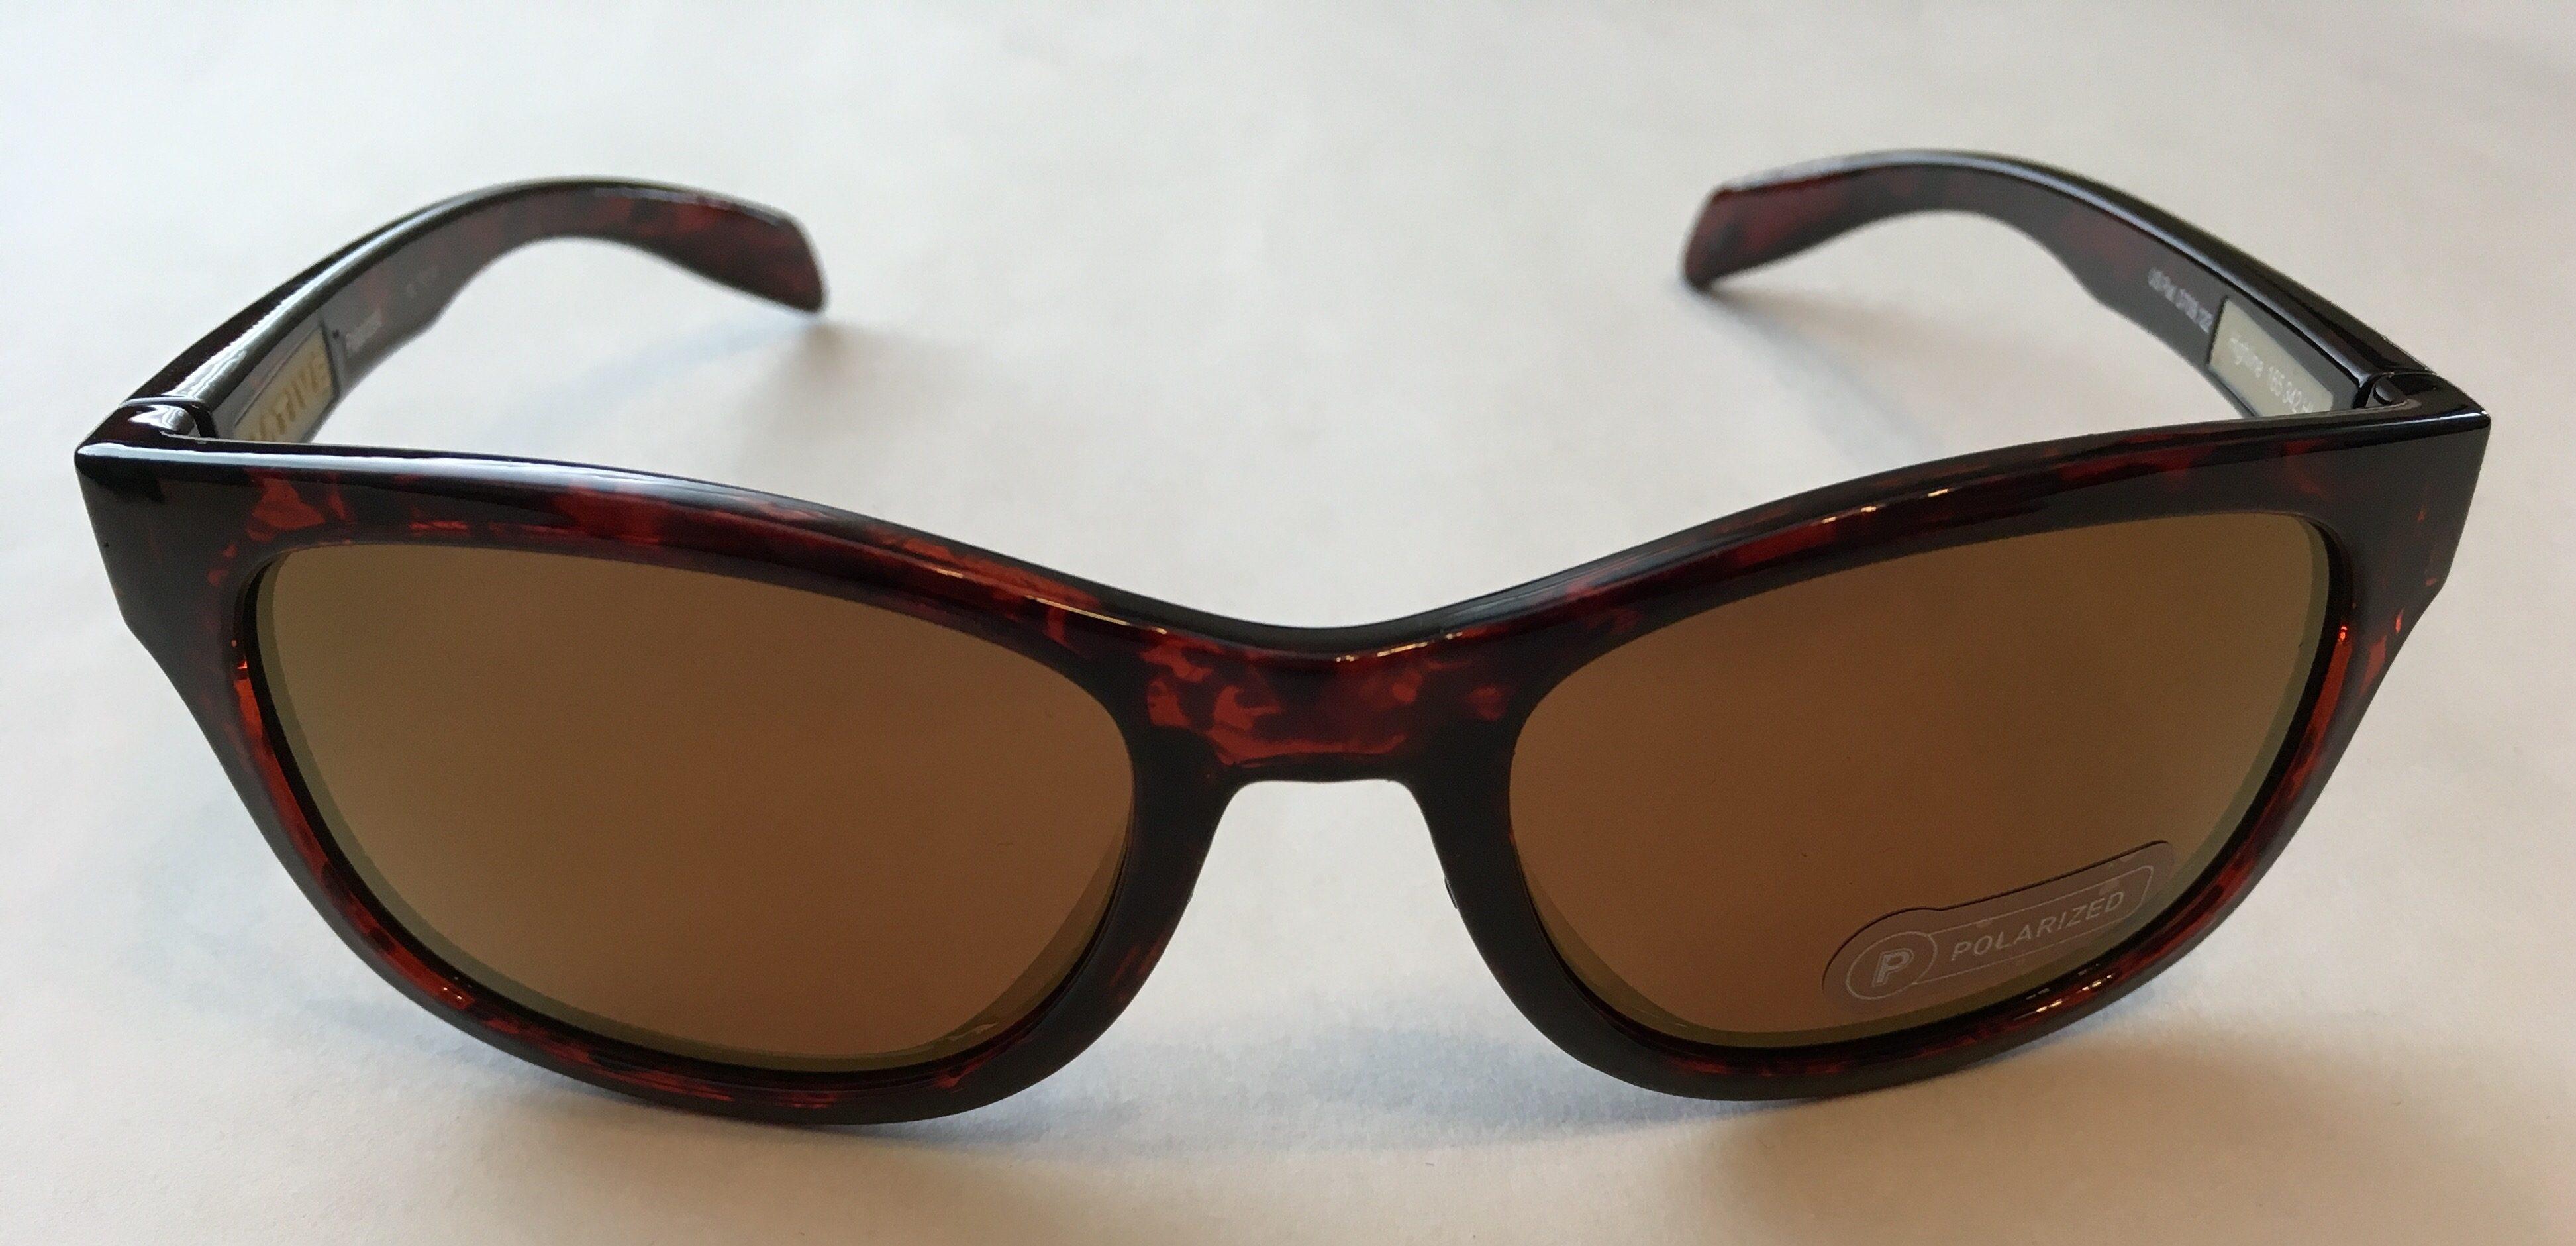 06414e26d3 Native Eyewear Highline Sunglasses - Maple Tortoise Sand POLARIZED N3 Bronze